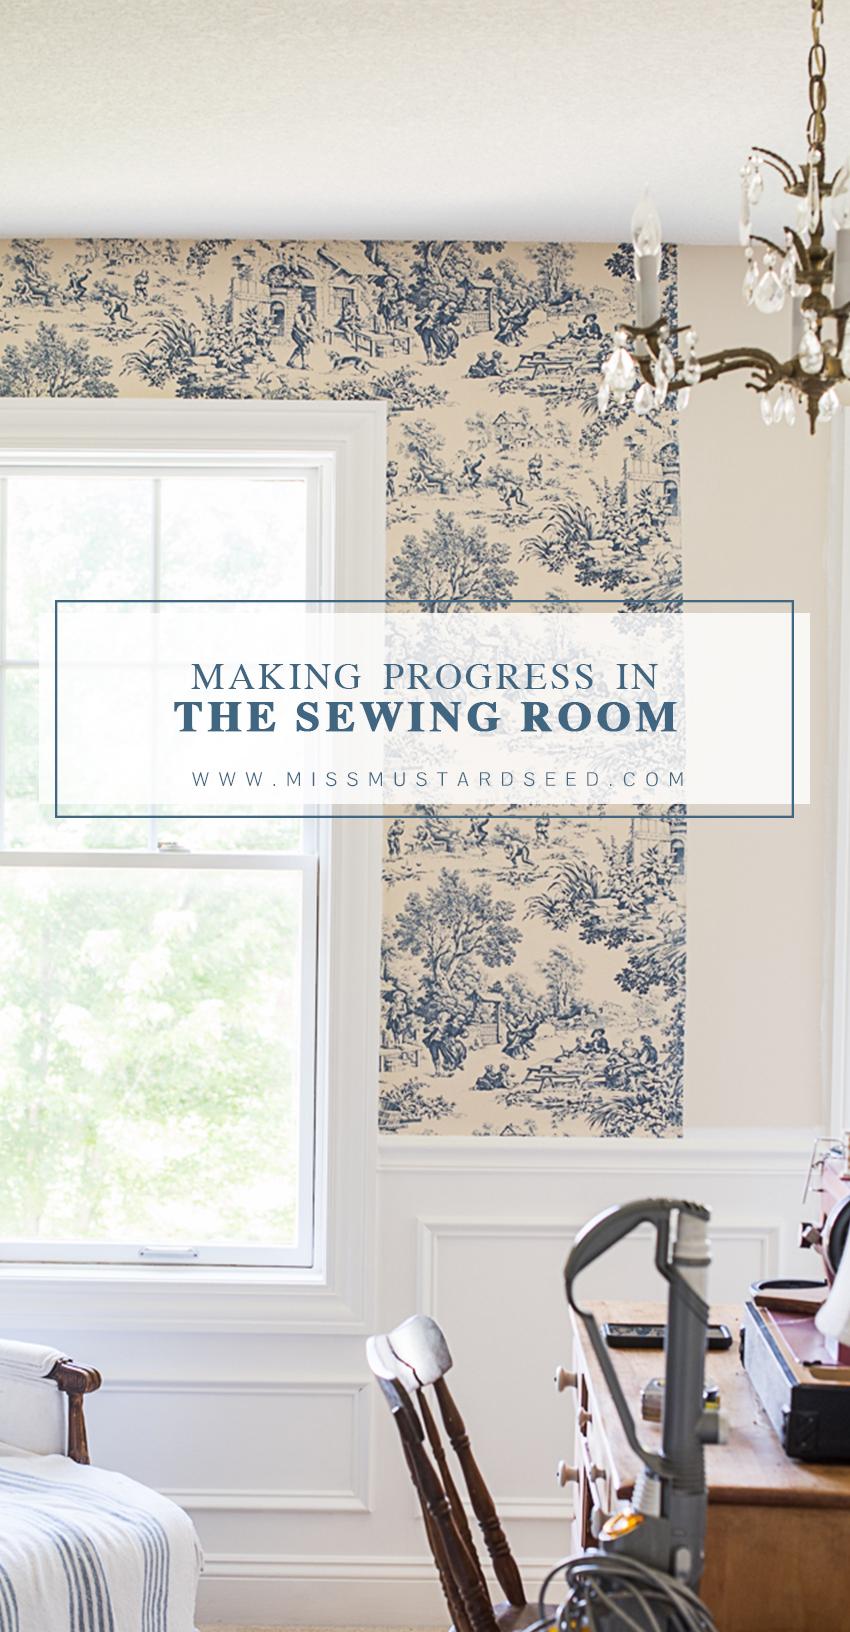 making progress in the sewing room | www.missmustardseed.com | miss mustard seed